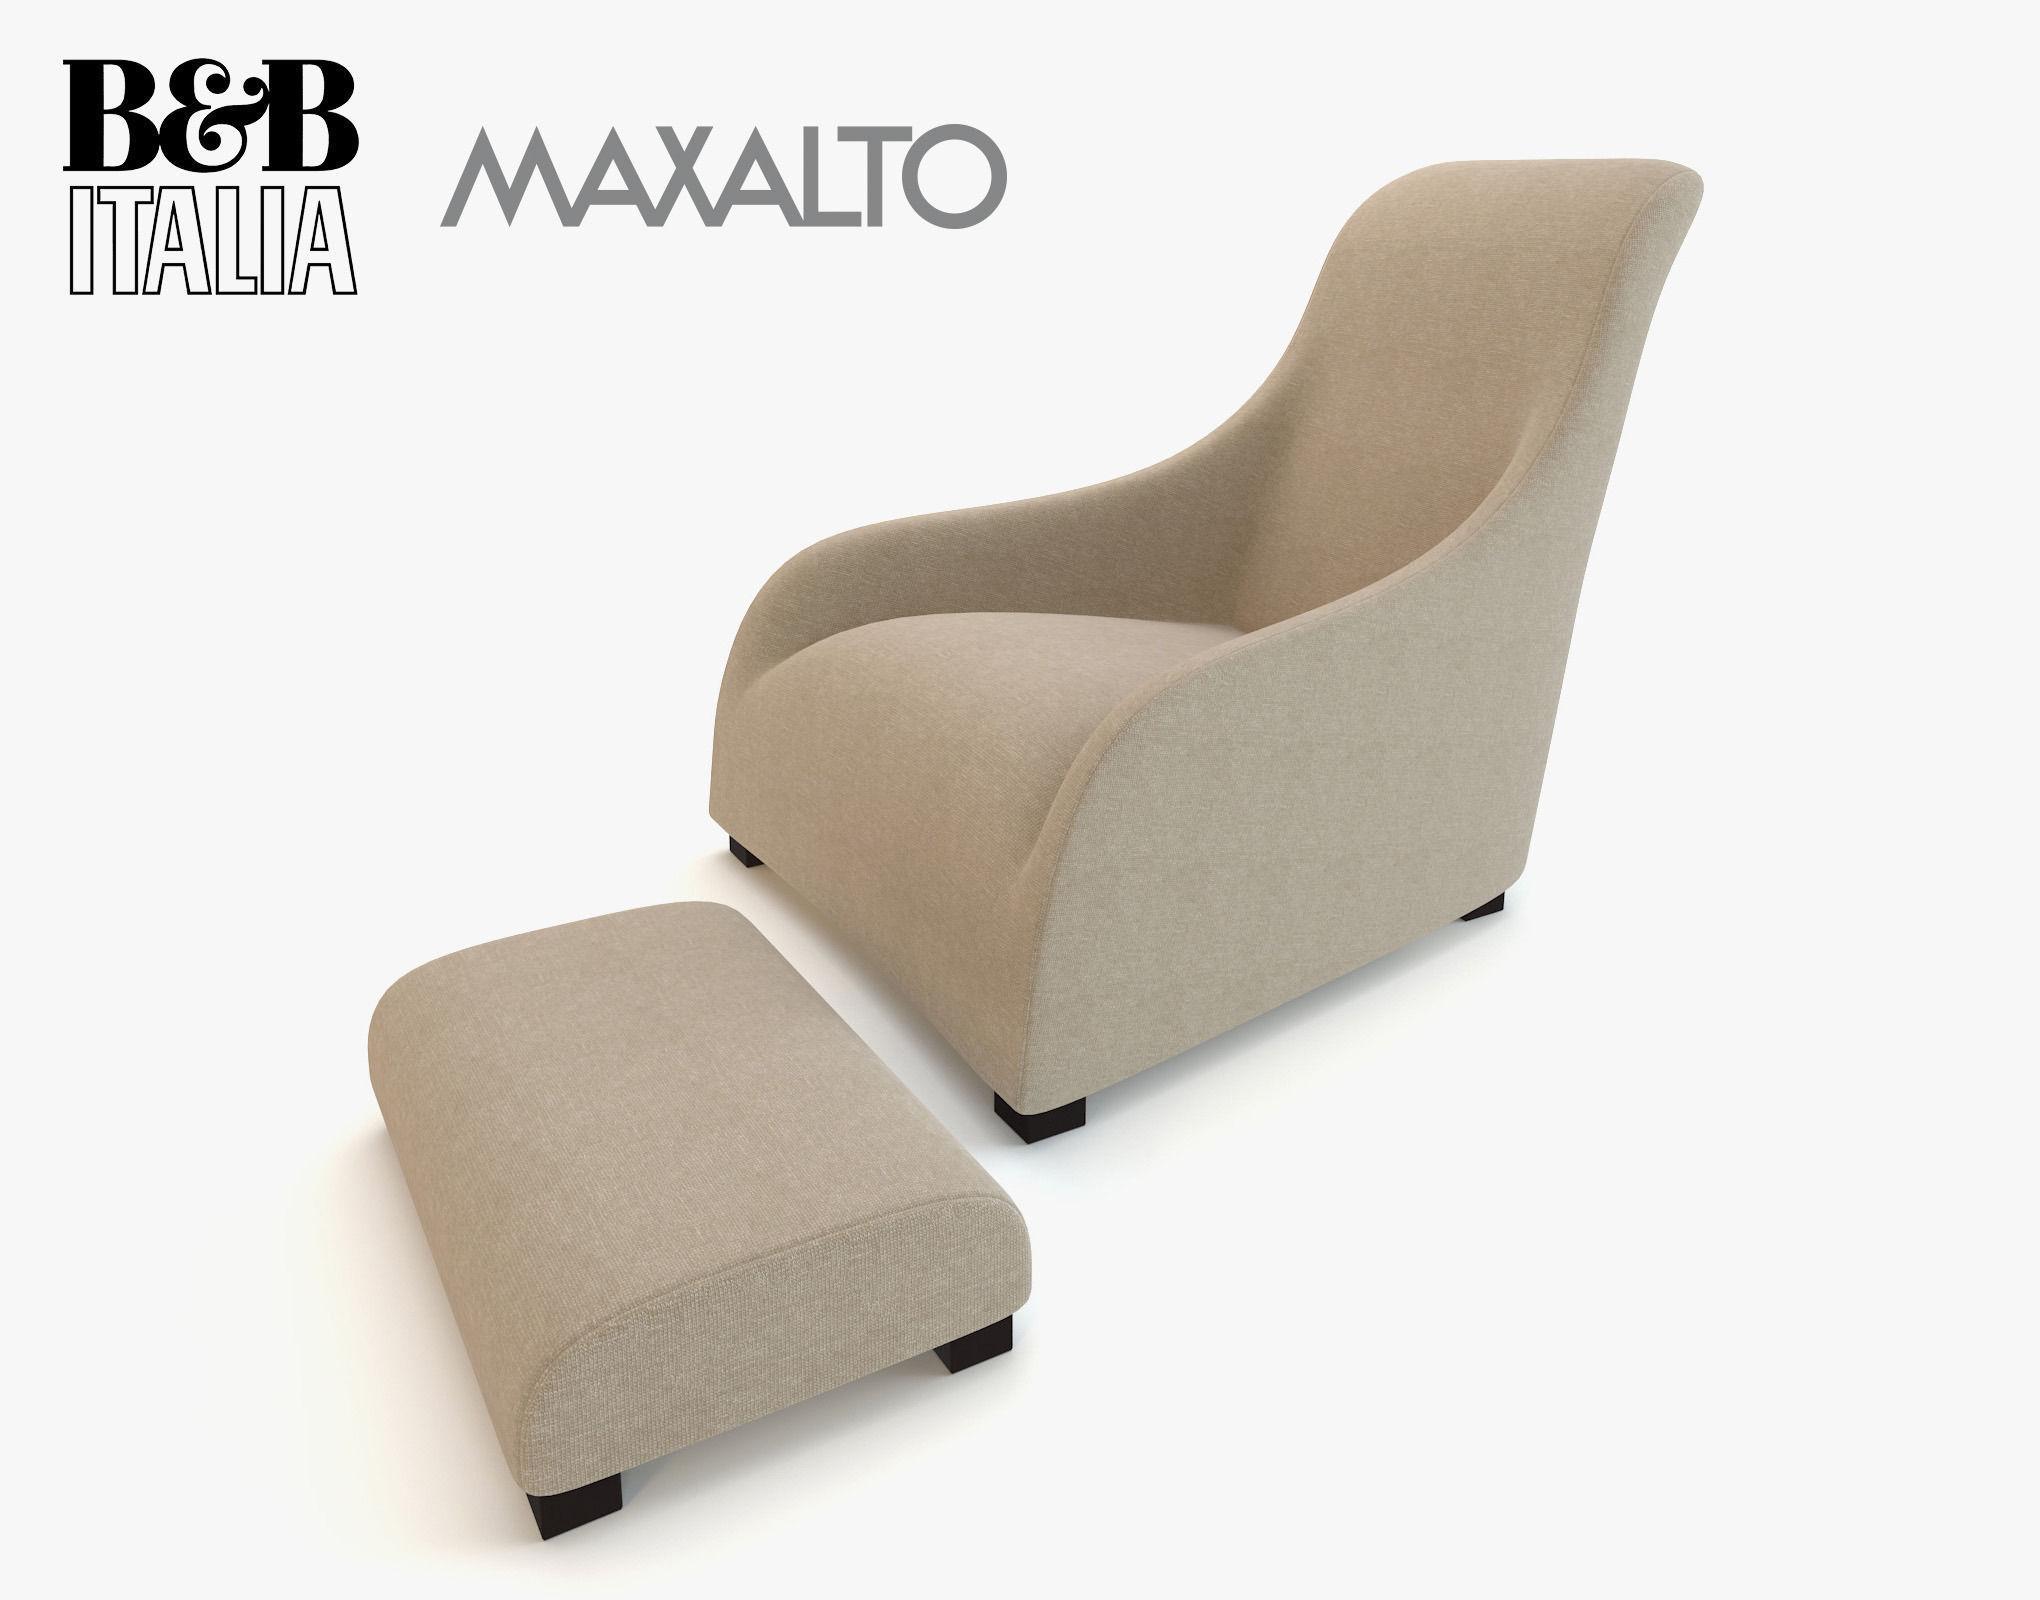 Bebitalia armchair maxalto kalos apta with 3d model for B b maxalto